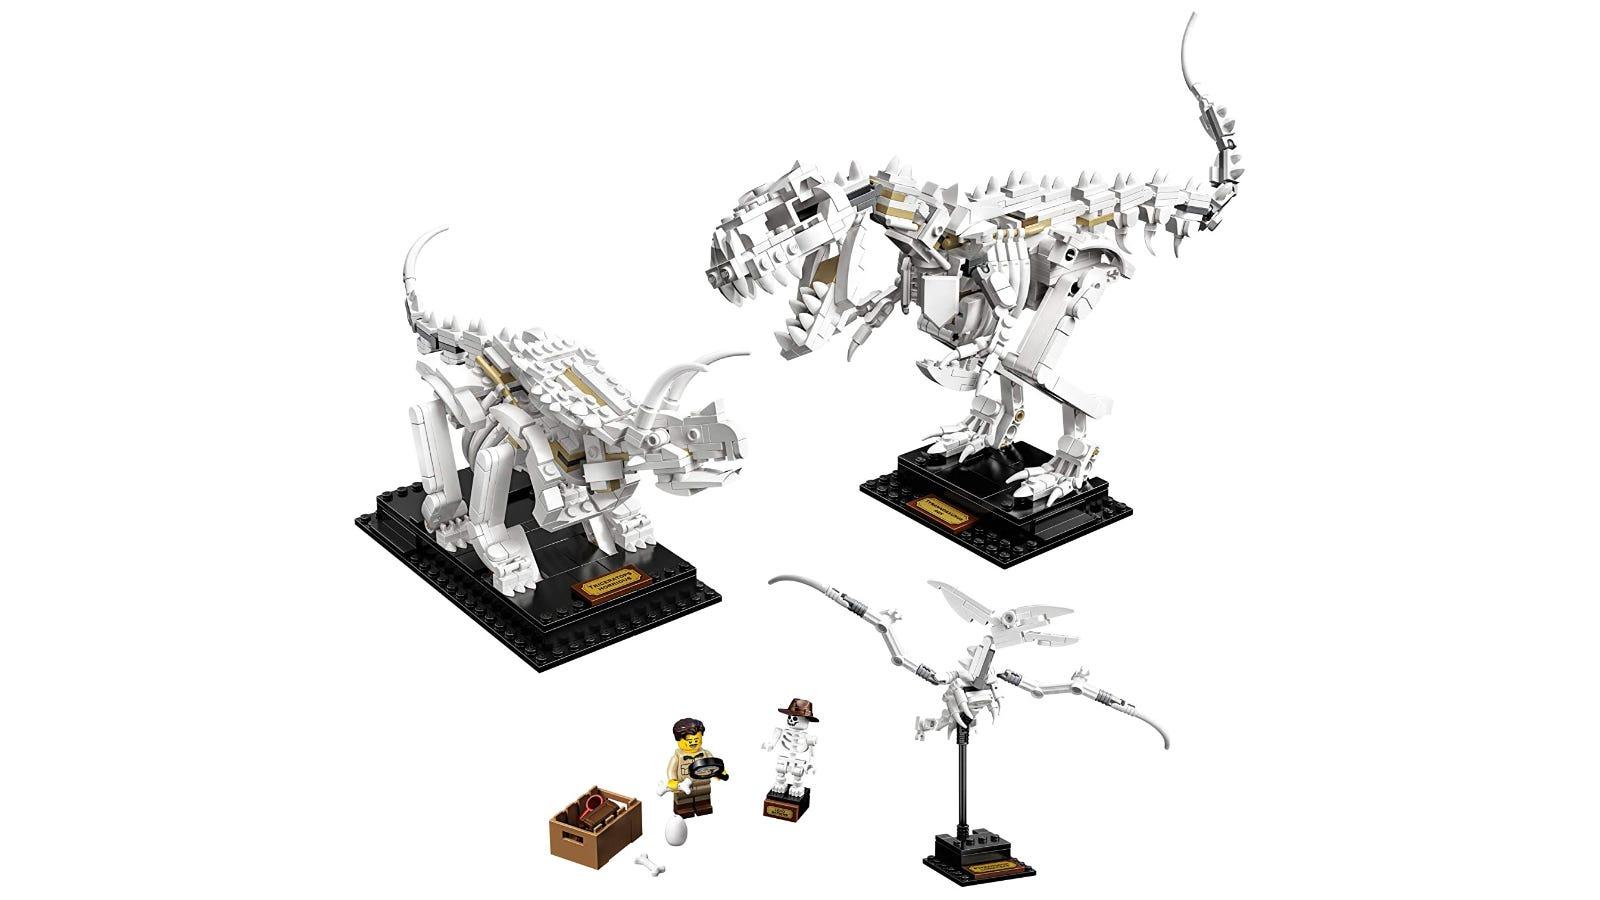 LEGO Ideas Dinosaur Fossils set